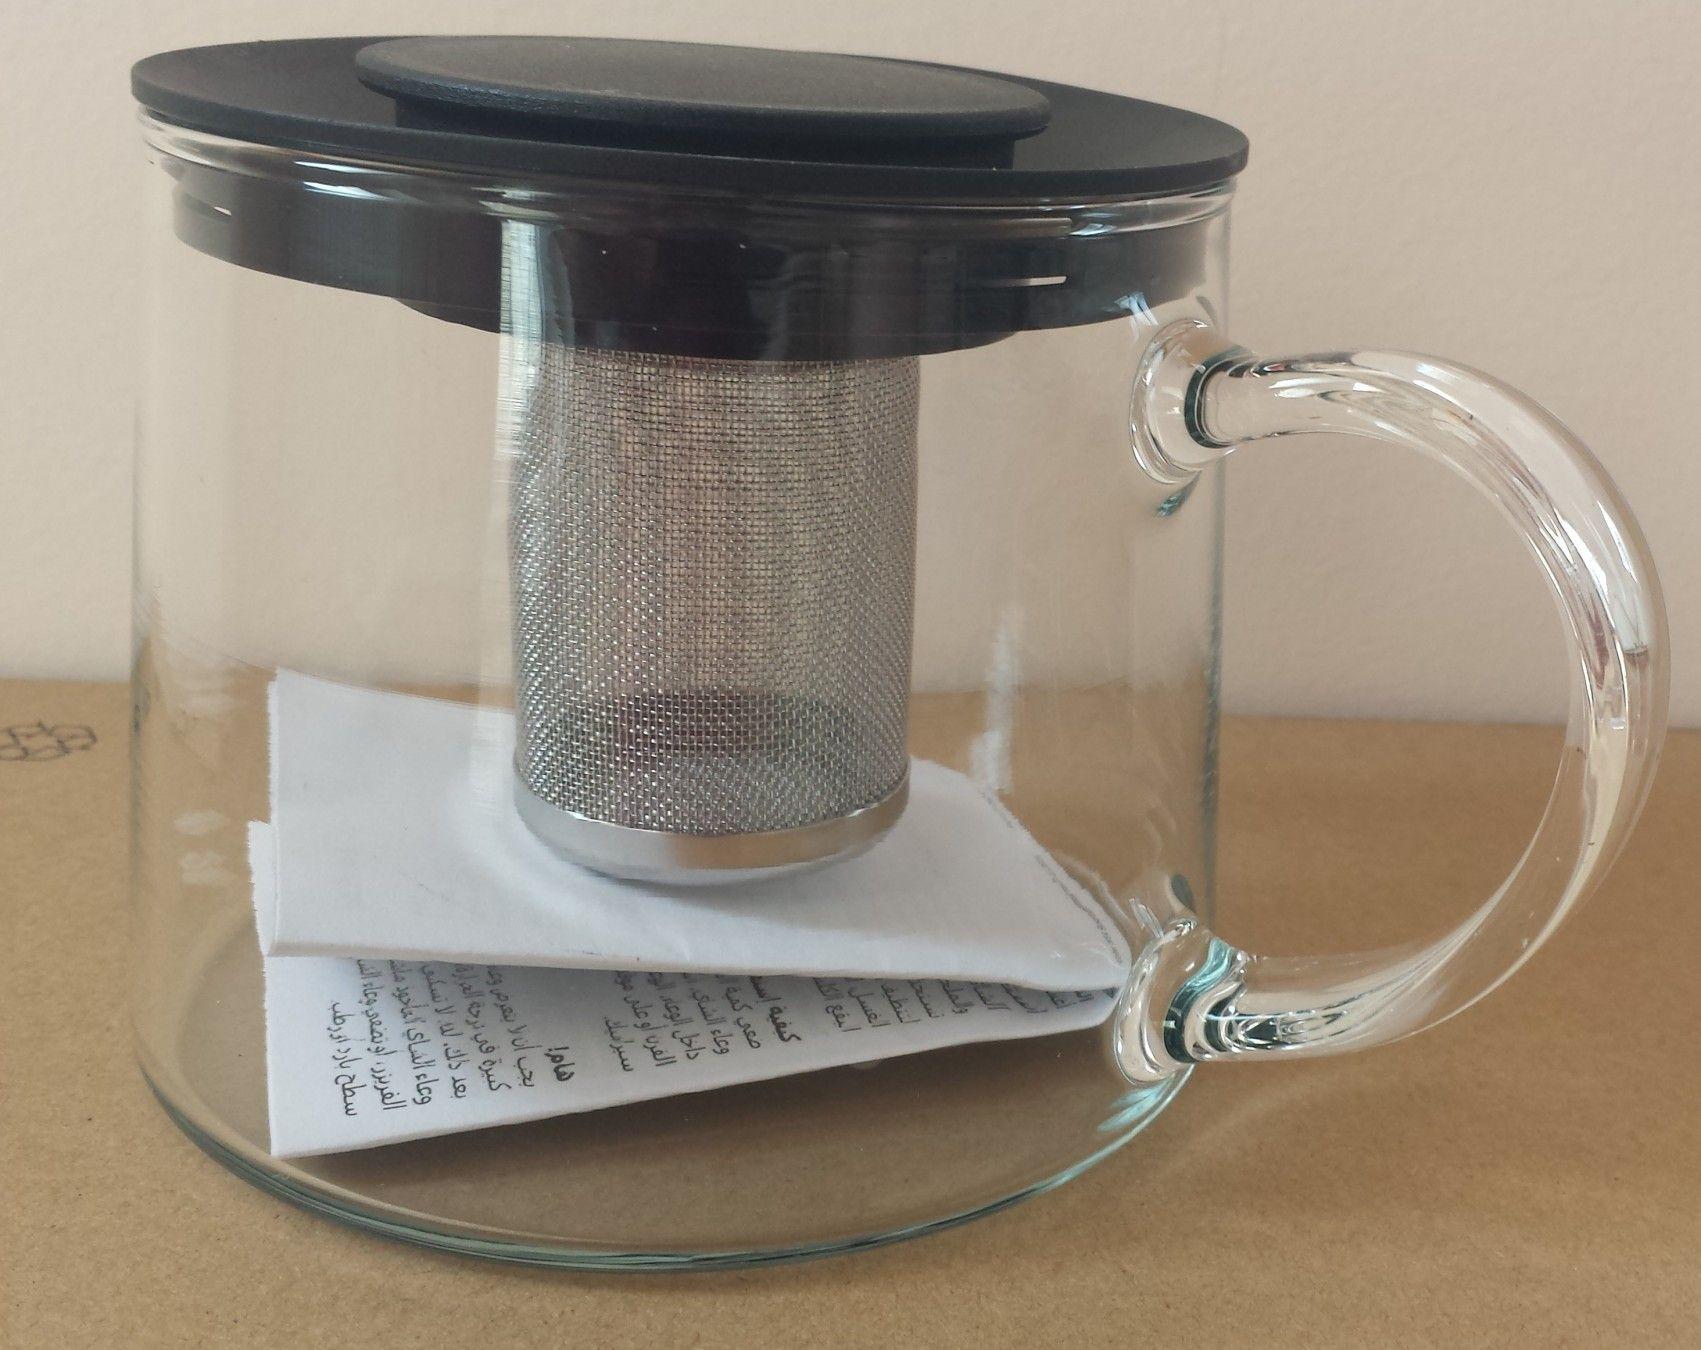 ikea rectangular glass vase of stakleni cajnik veoma kvalitetan 0 6l novo ikea furniture home inside stakleni cajnik veoma kvalitetan 0 6l novo ikea